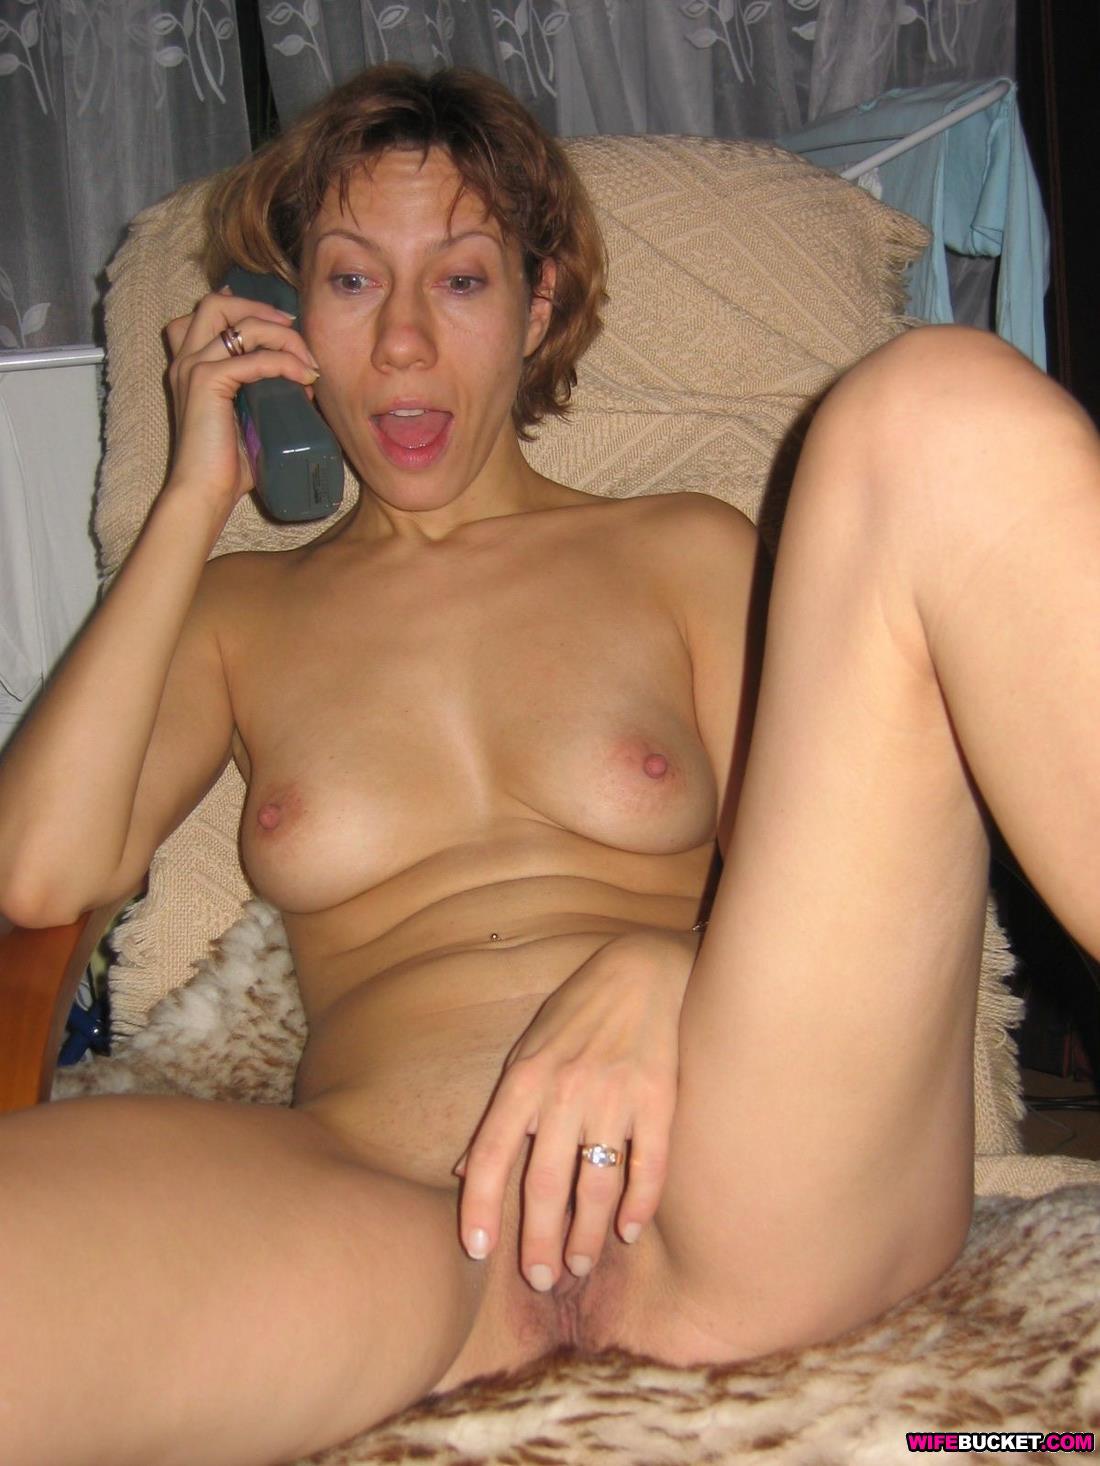 Drunk wife posing naked